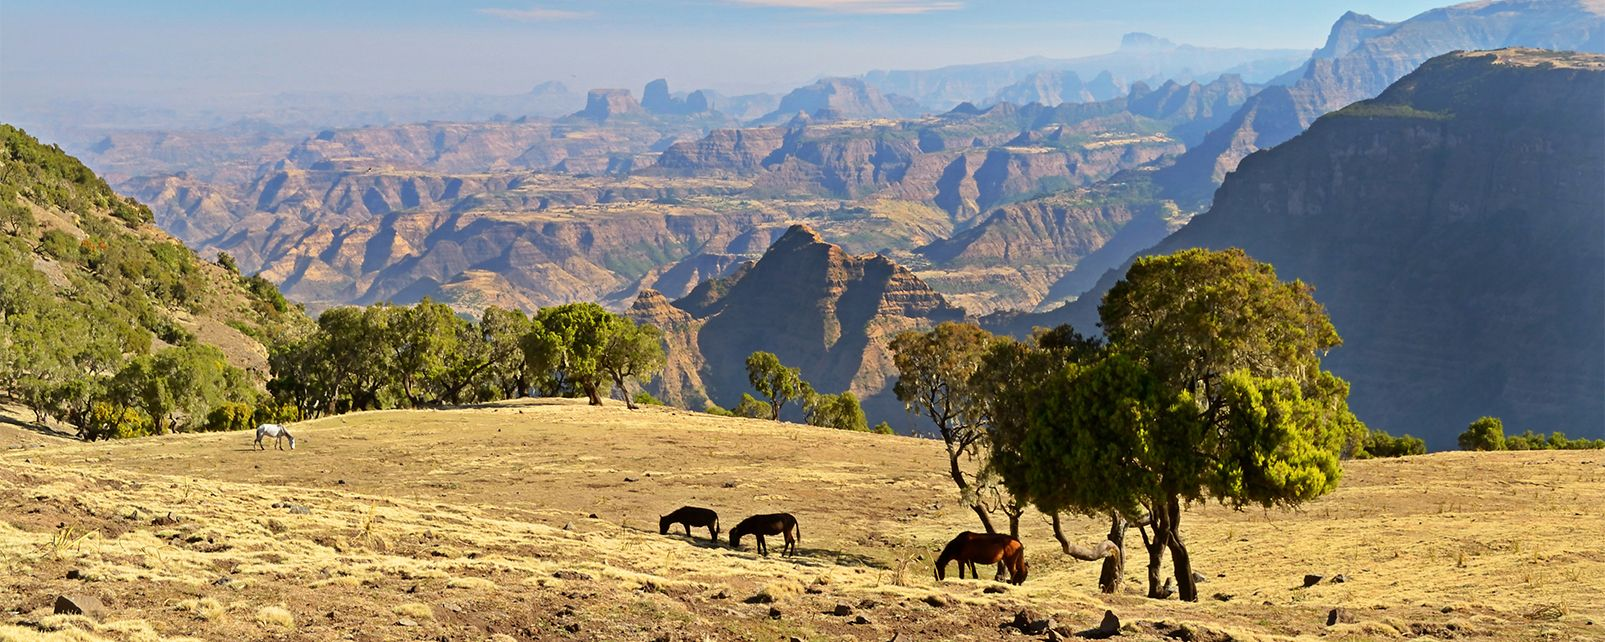 ethiopie-paysage